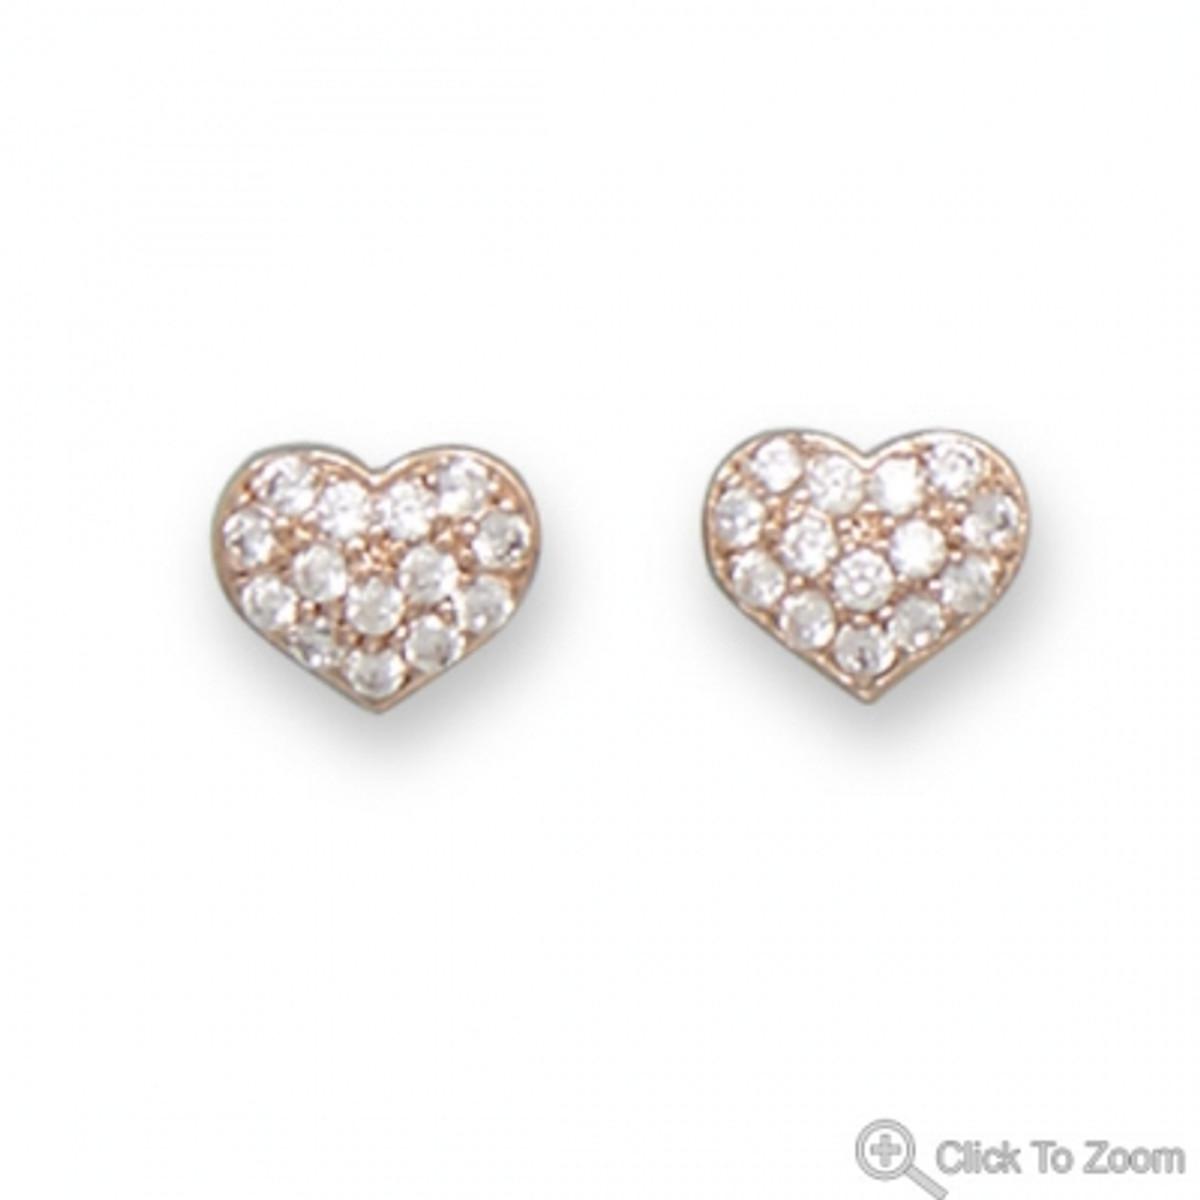 14 Karat Rose Gold Plated CZ Heart Earrings